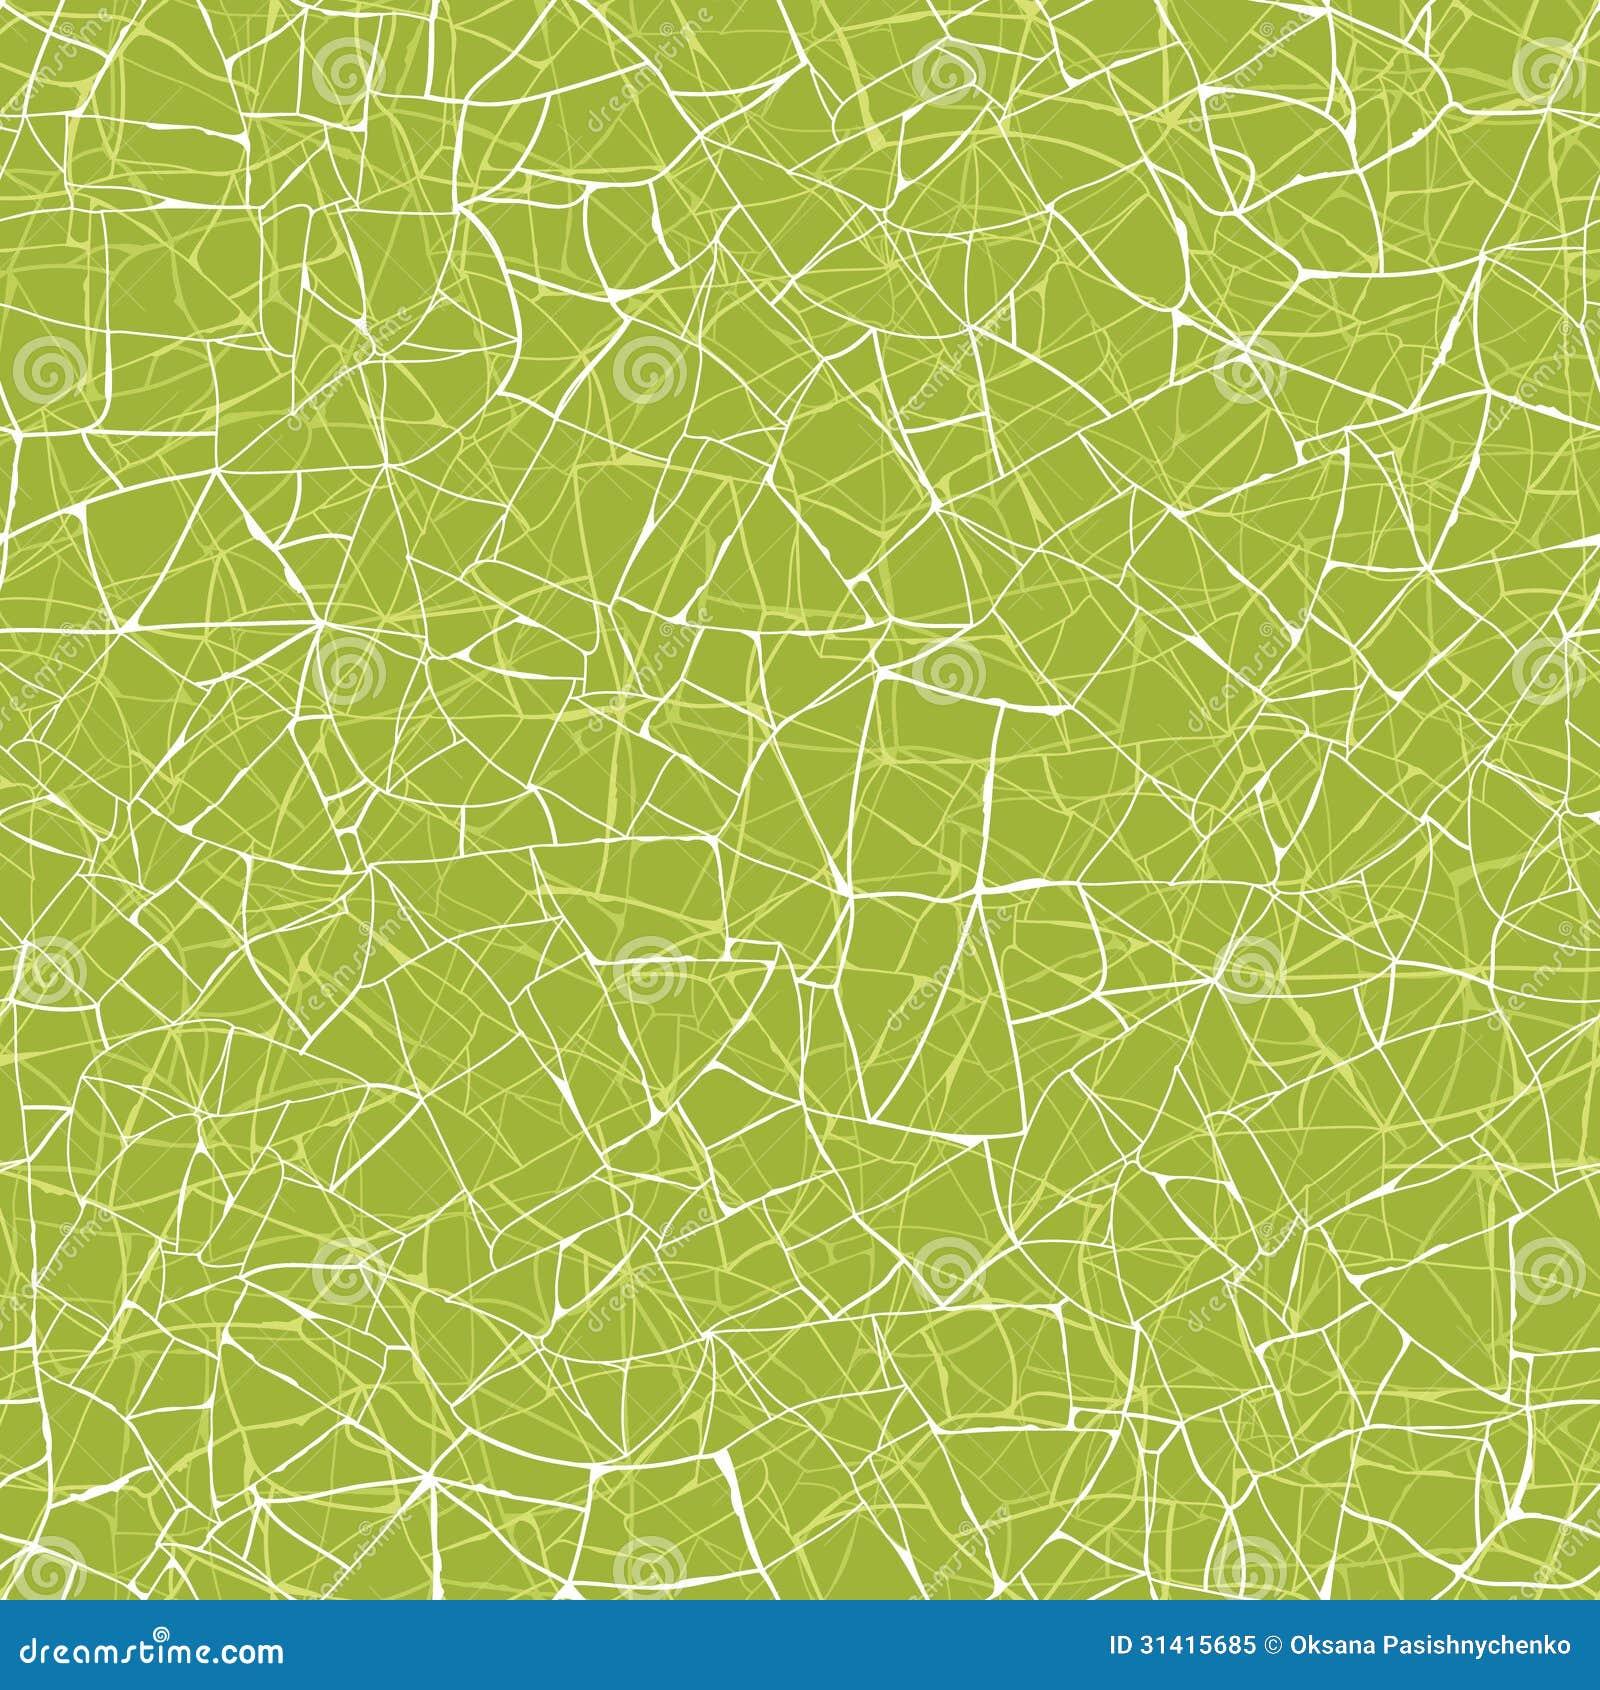 Line Art Background : Green mosaic texture seamless pattern background stock